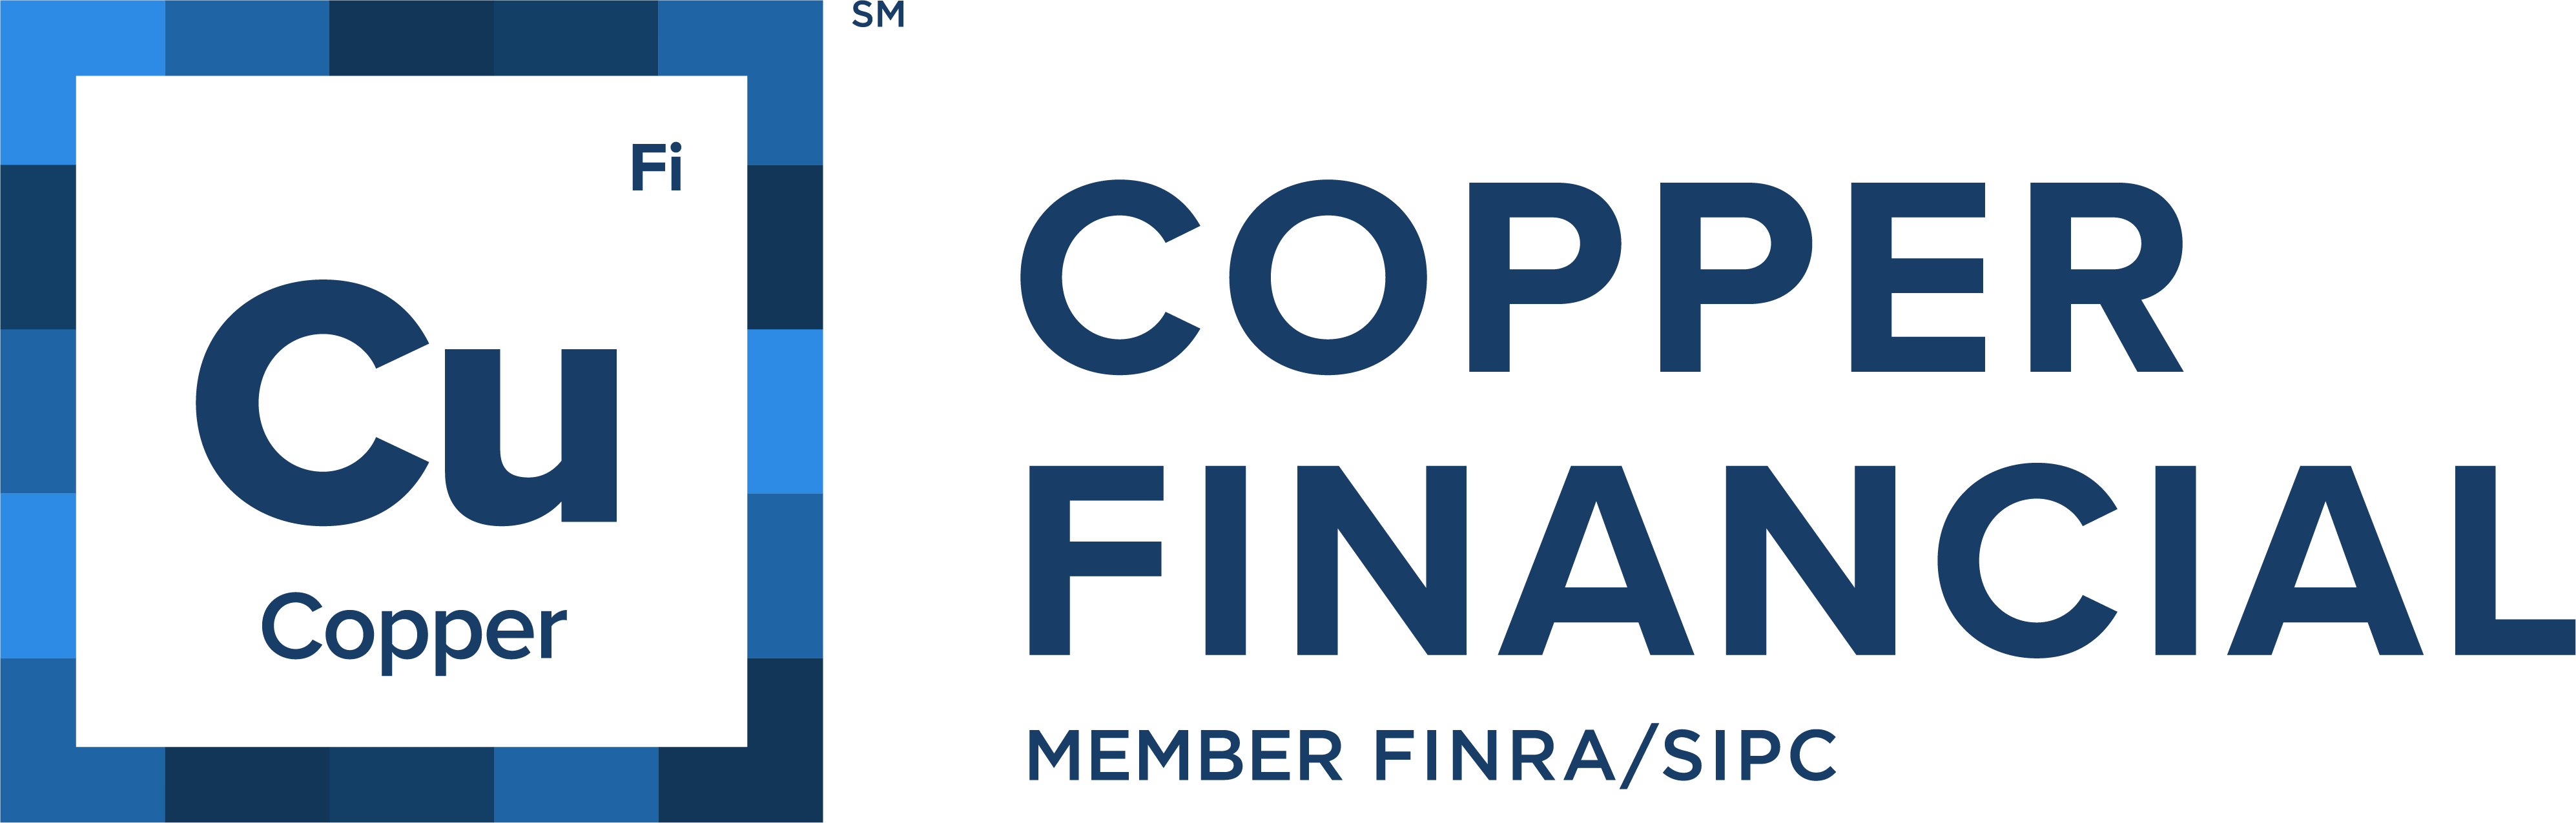 Copper Financial Network, LLC Logo